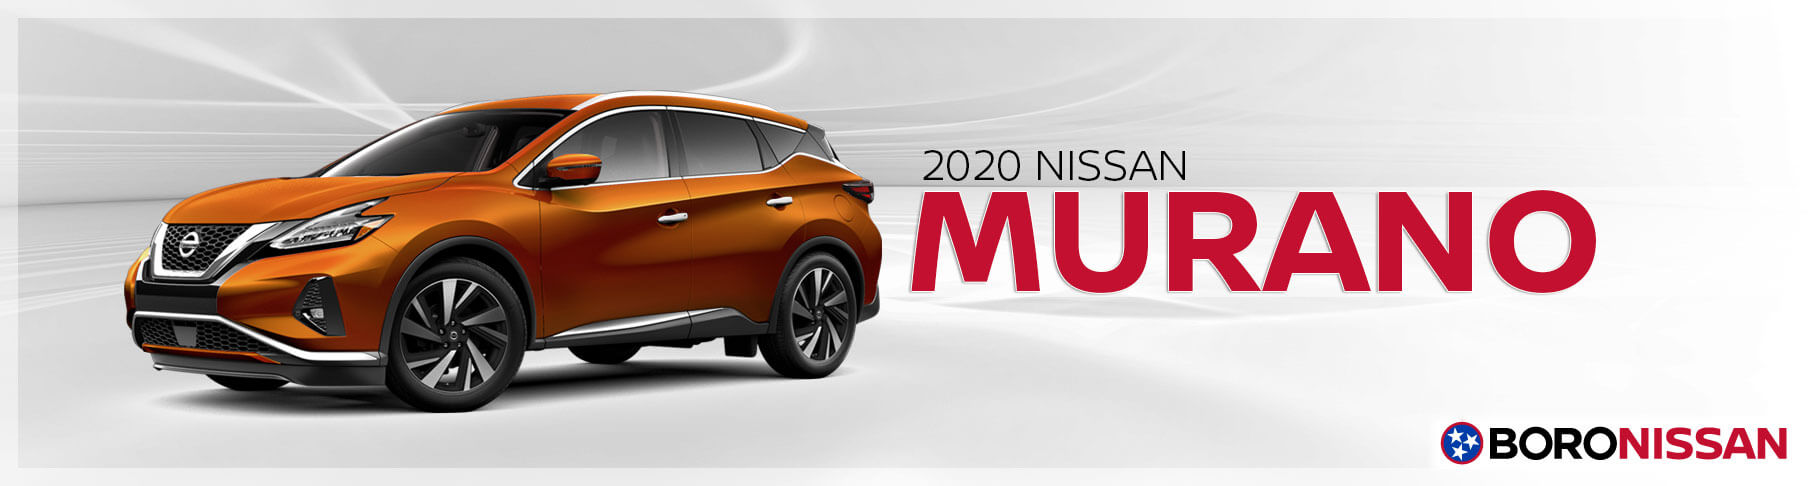 2020 Nissan Murano For Sale Near Nashville L Murfreesboro Nissan